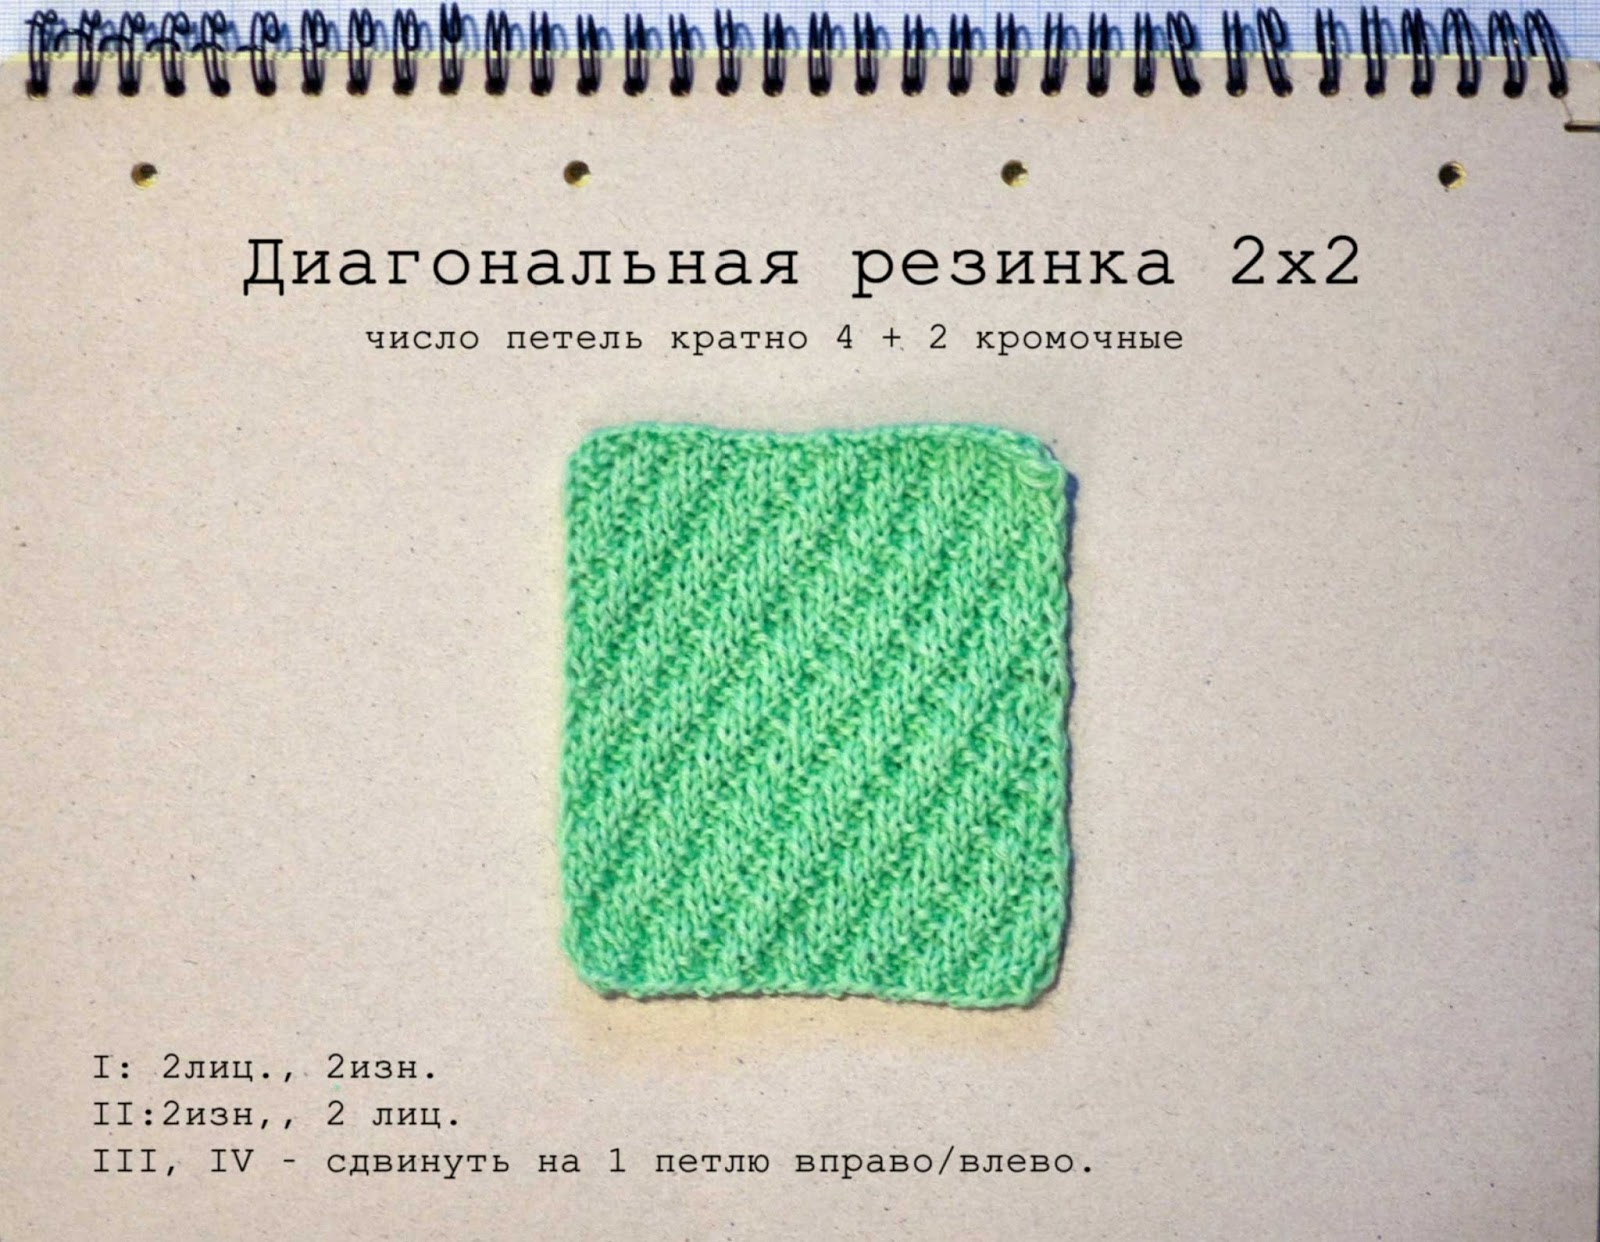 Вязание виды резинок на спицах фото